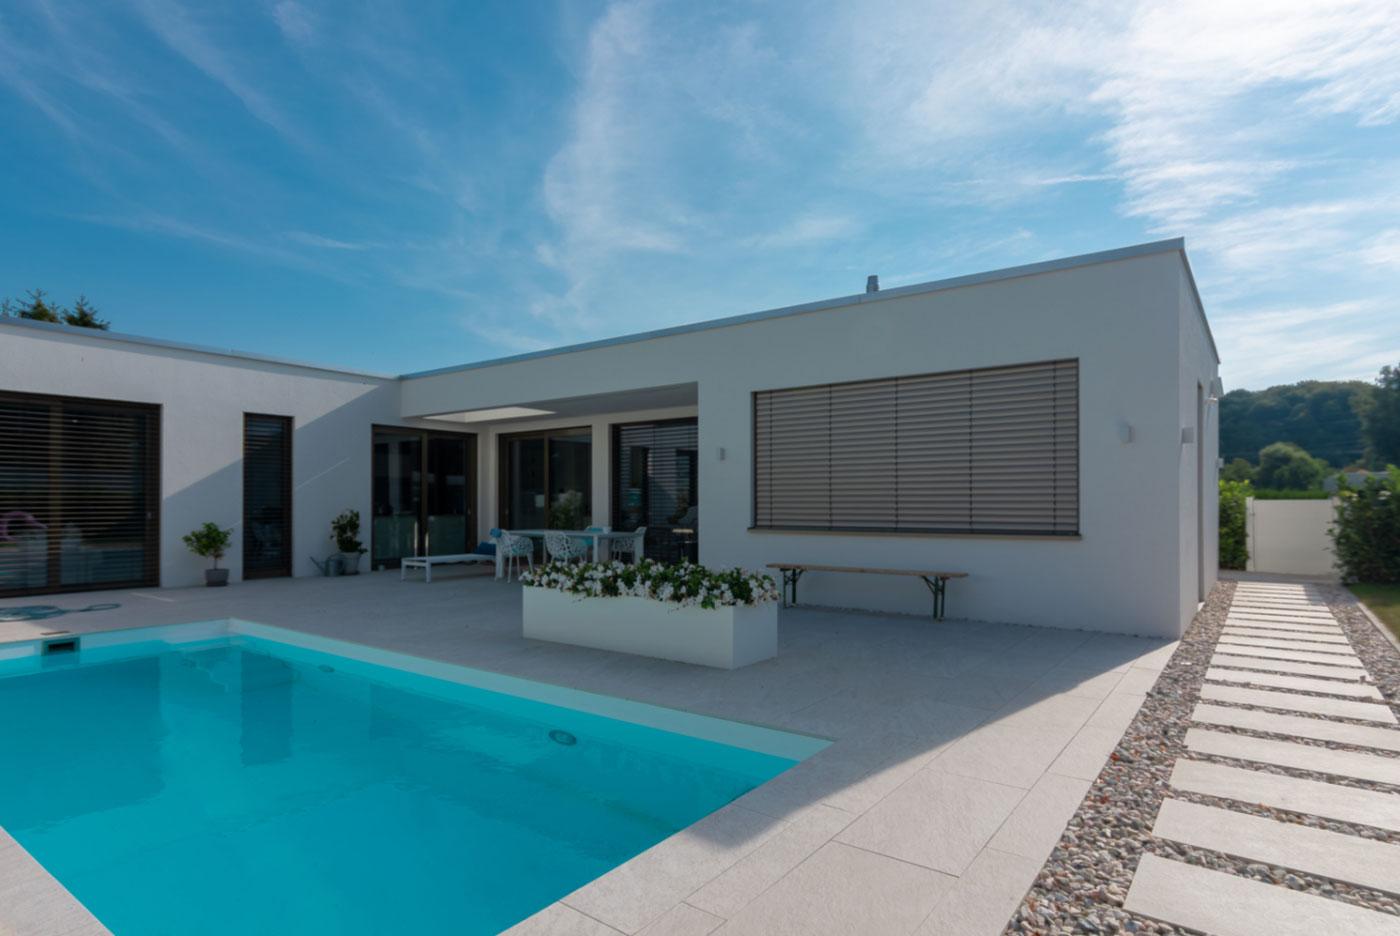 Einfamilienhaus, Pool, Flachdach, Bauhausstil, modern, planen